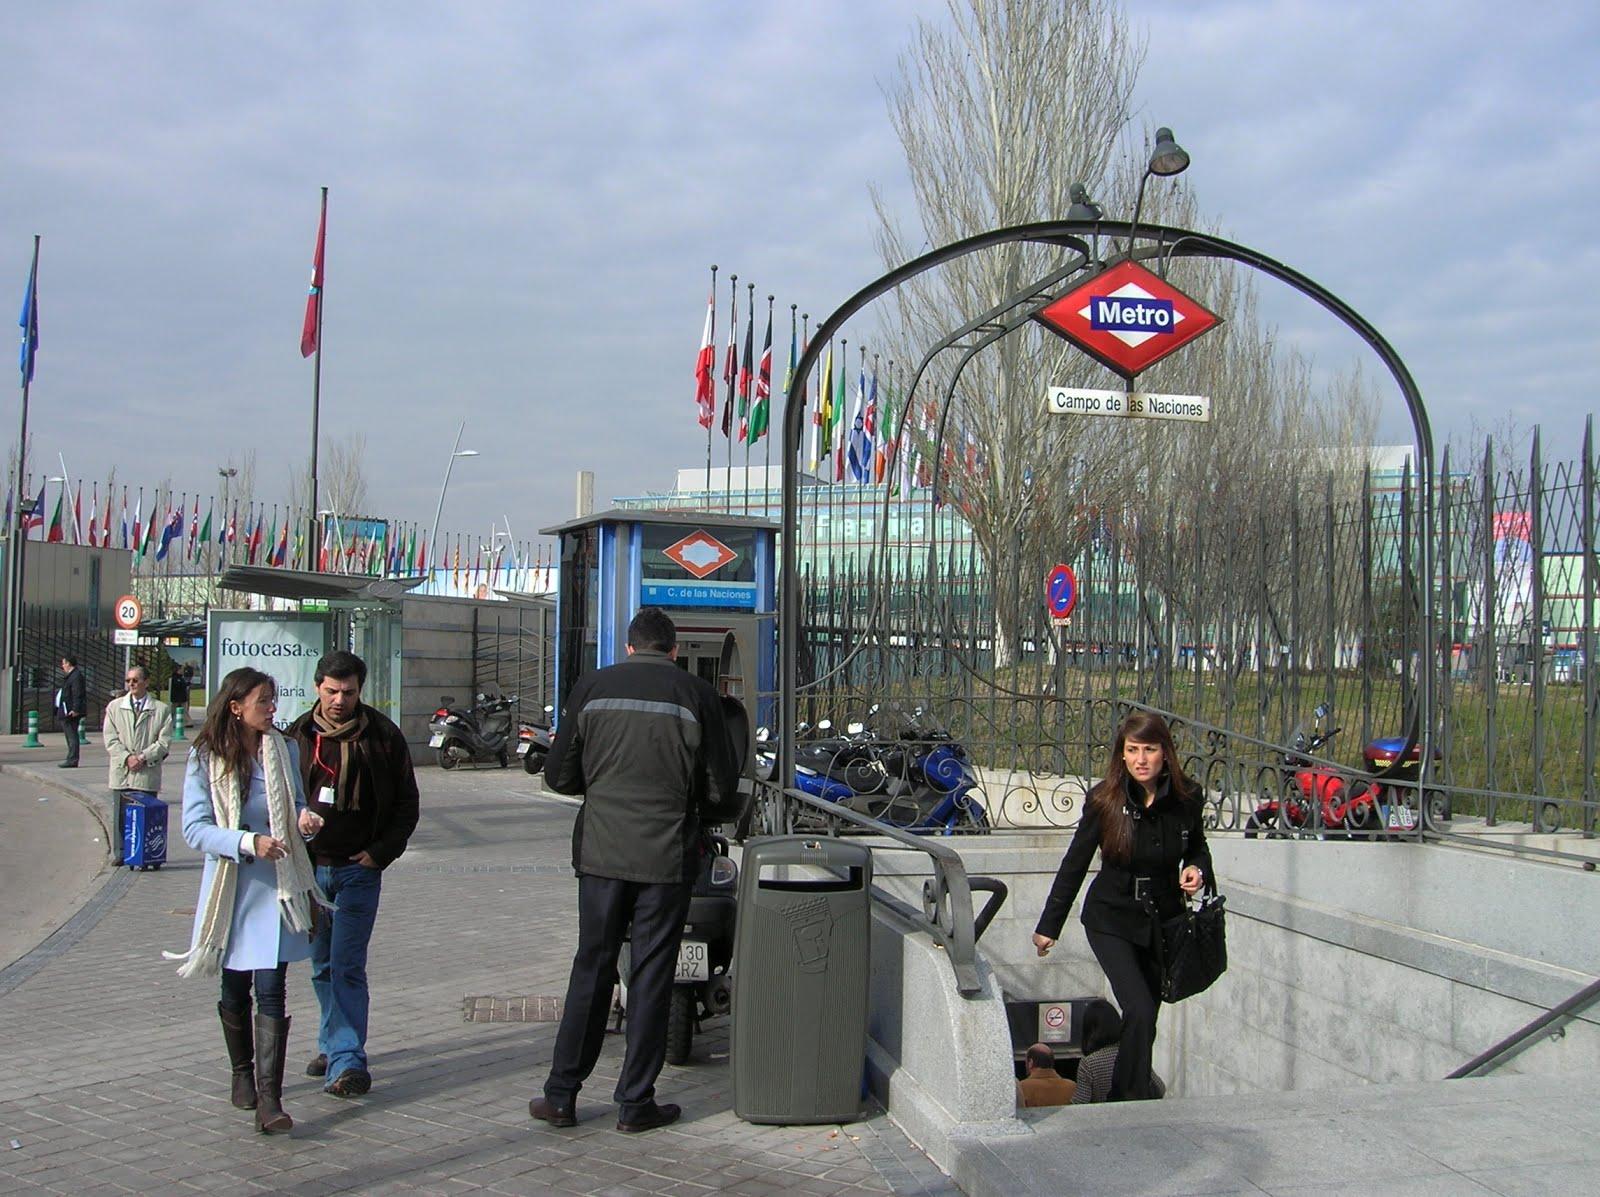 Fitur, parada metro Ifema, metro Madrid, vuelta al mundo, round the world, La vuelta al mundo de Asun y Ricardo